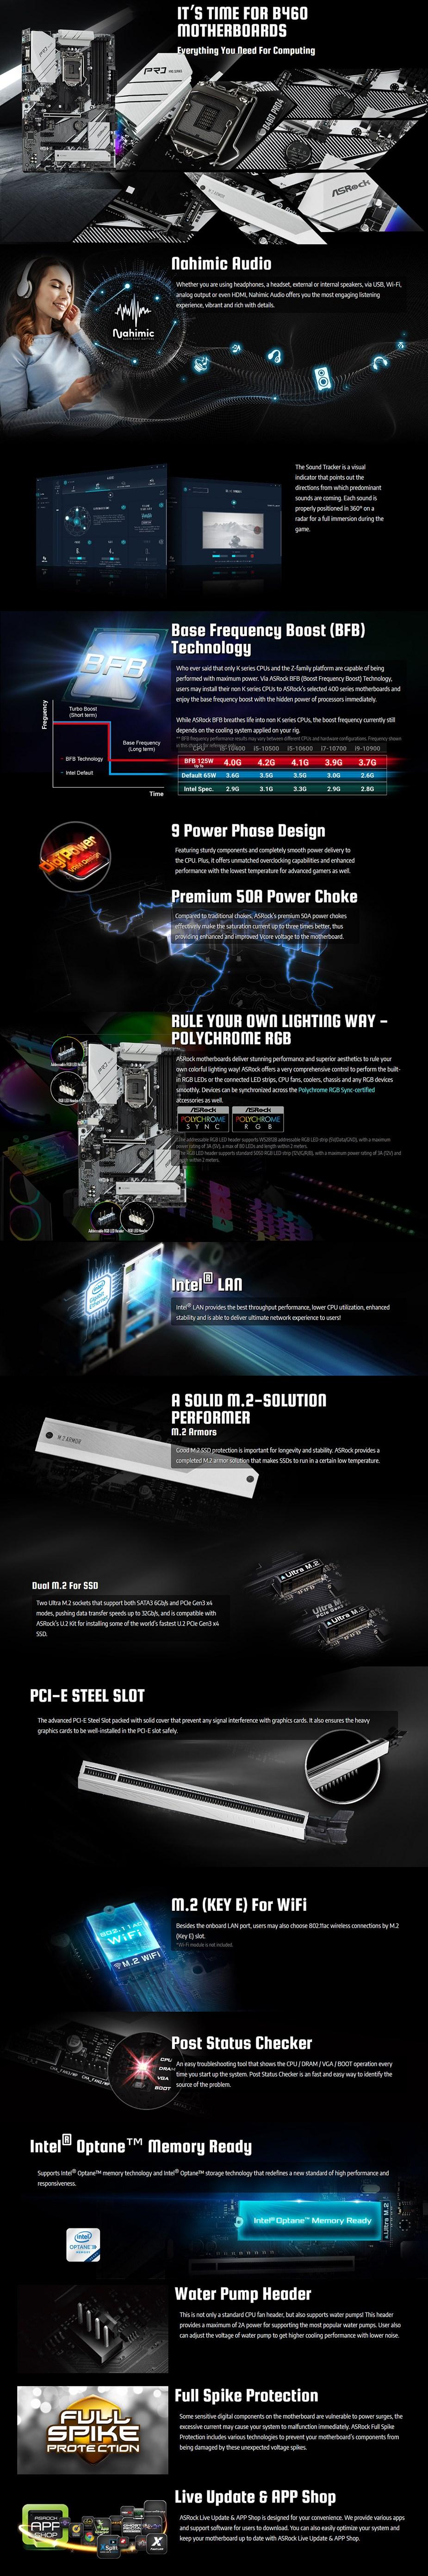 asrock-b460-pro4-lga-1200-atx-motherboard-ac35480-8.jpg